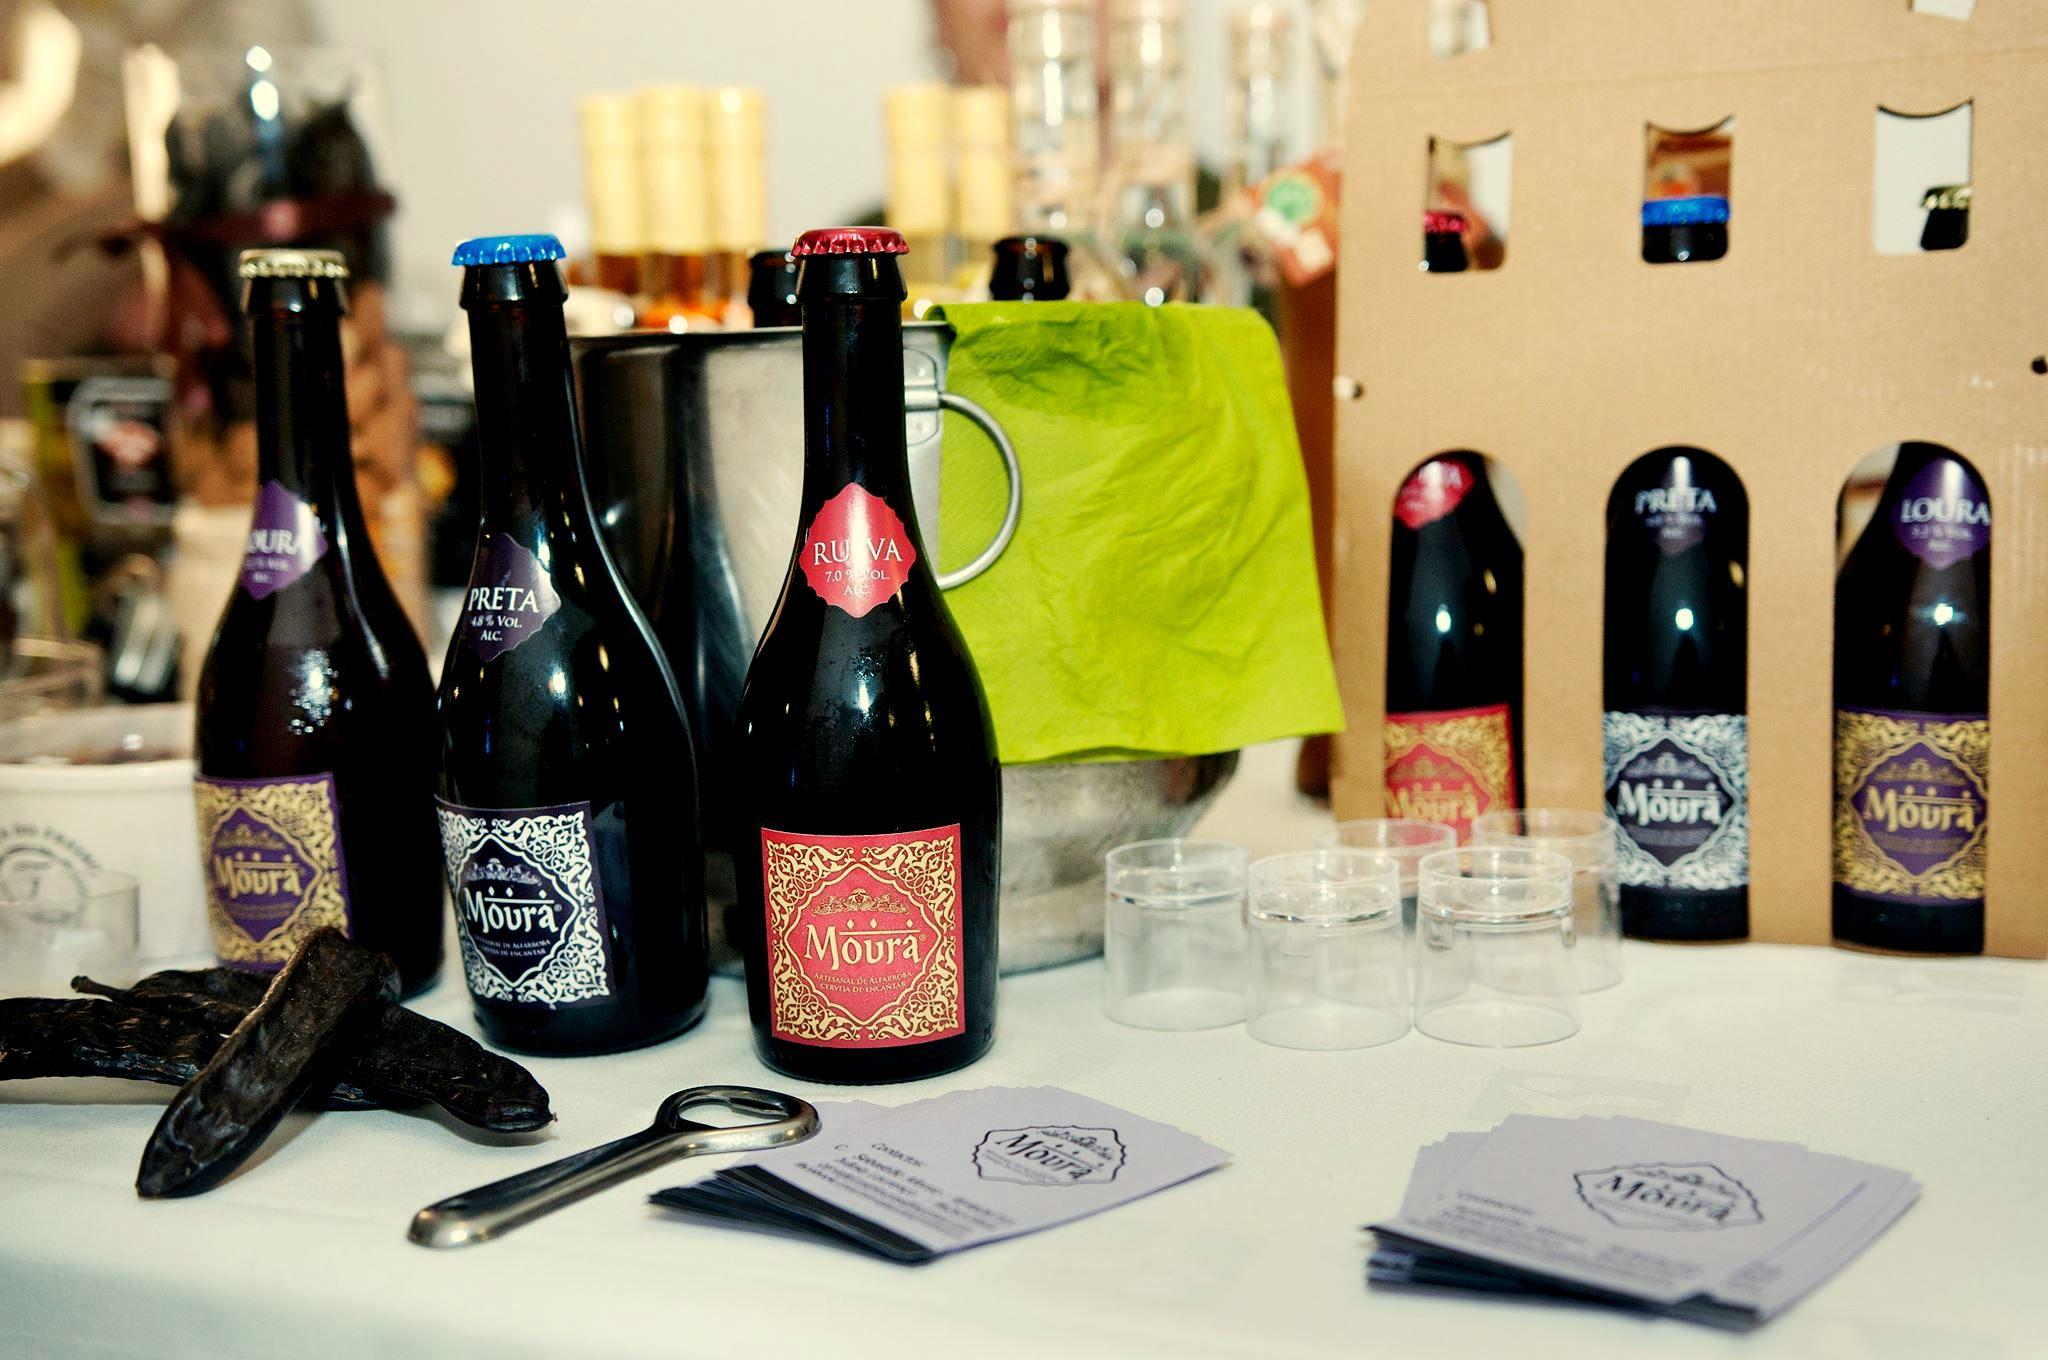 Cerveja Moura (2)